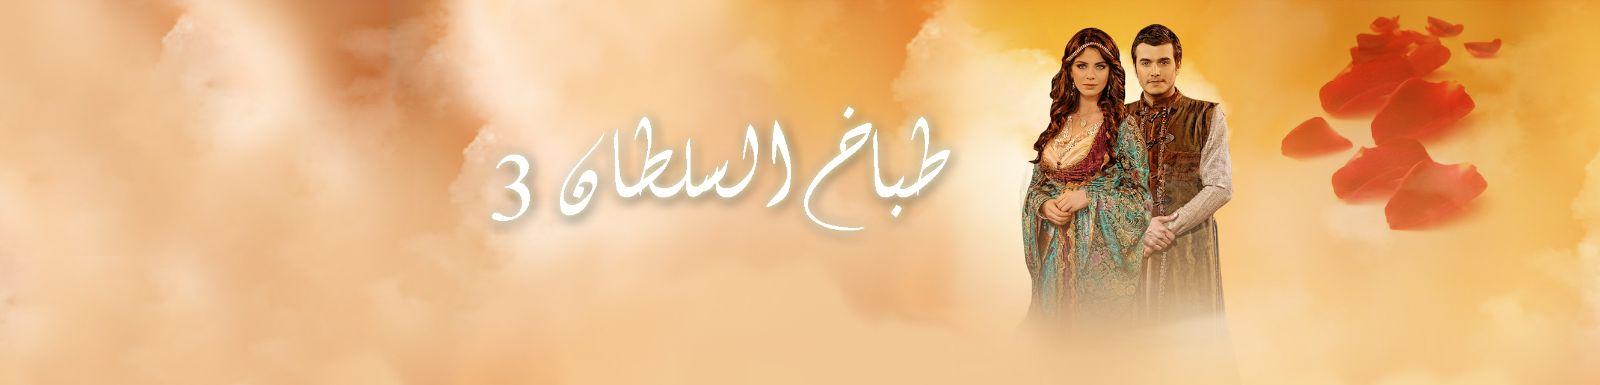 ����� ����� ���� ������� �3 ������ 16 ����� MBC shahid ���� ��